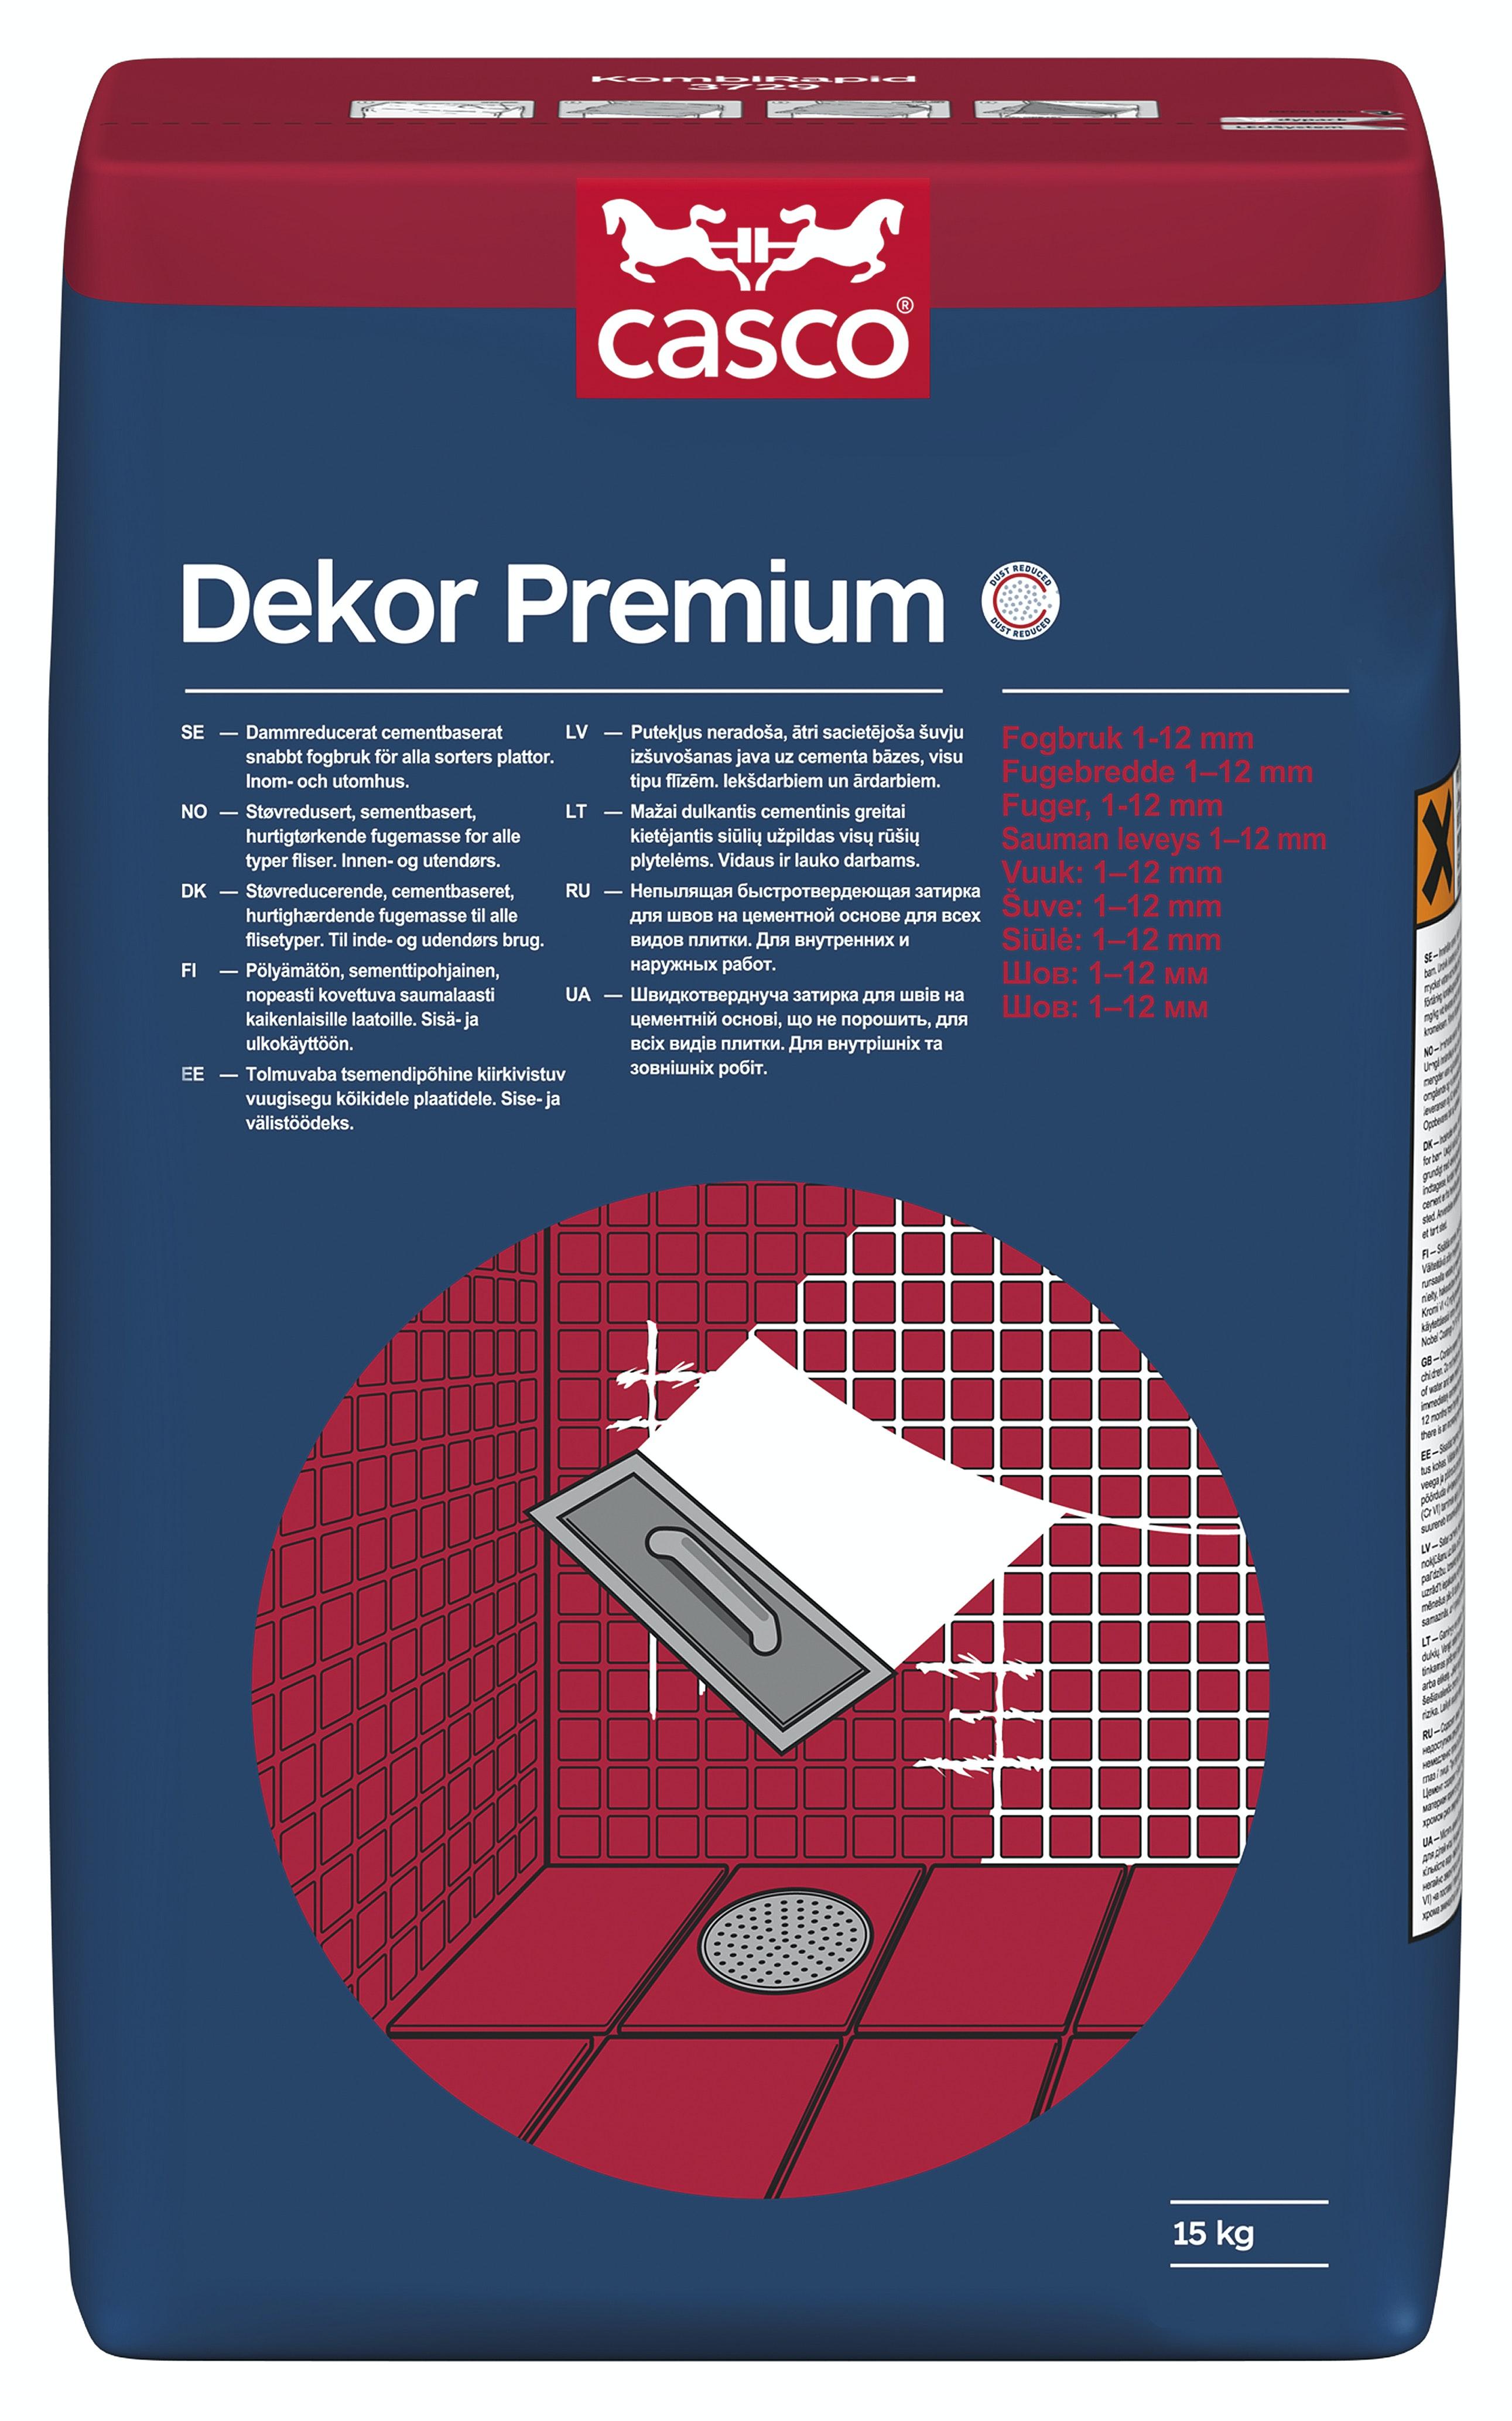 Fog Casco Dekor Premium Grafit 15kg